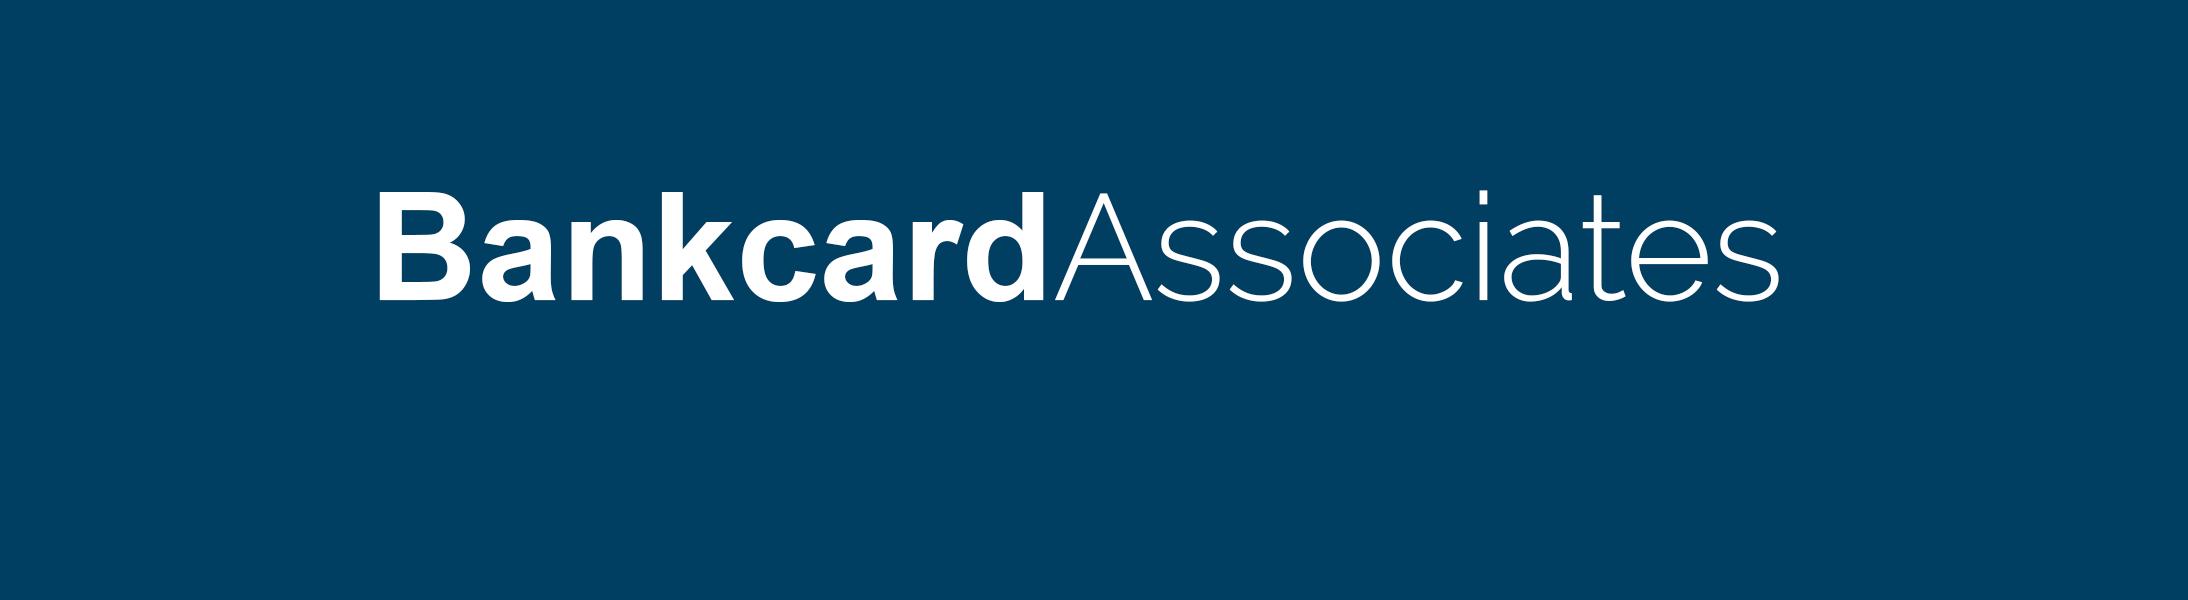 Bankcard Associates